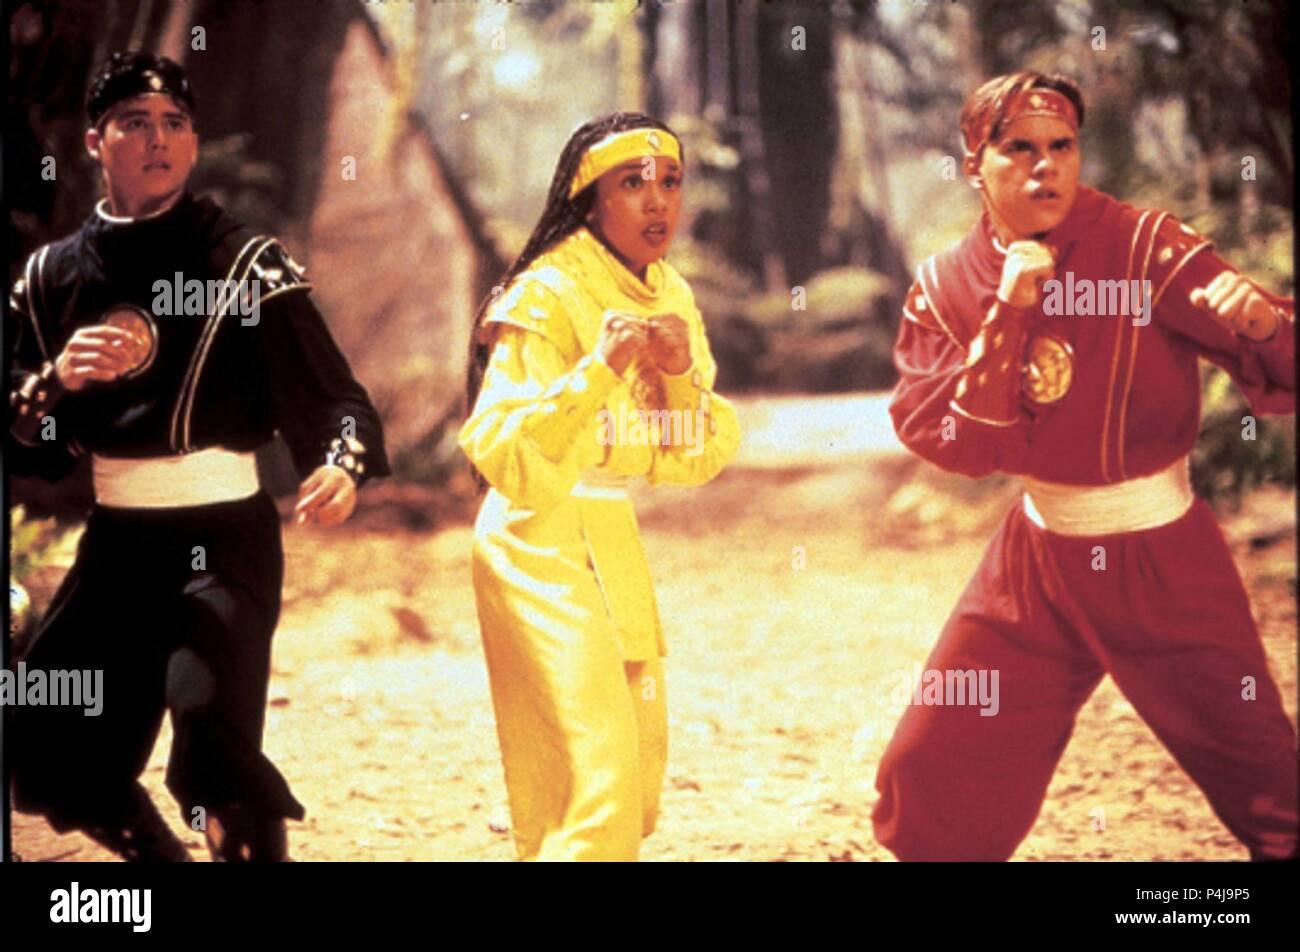 Original Film Title: MIGHTY MORPHIN POWER RANGERS: THE MOVIE.  English Title: MIGHTY MORPHIN POWER RANGERS: THE MOVIE.  Film Director: BRYAN SPICER; STEVE WANG.  Year: 1995.  Stars: KARAN ASHLEY; STEVE CARDENAS; JOHNNY YONG. Credit: 20TH CENTURY FOX / Album - Stock Image